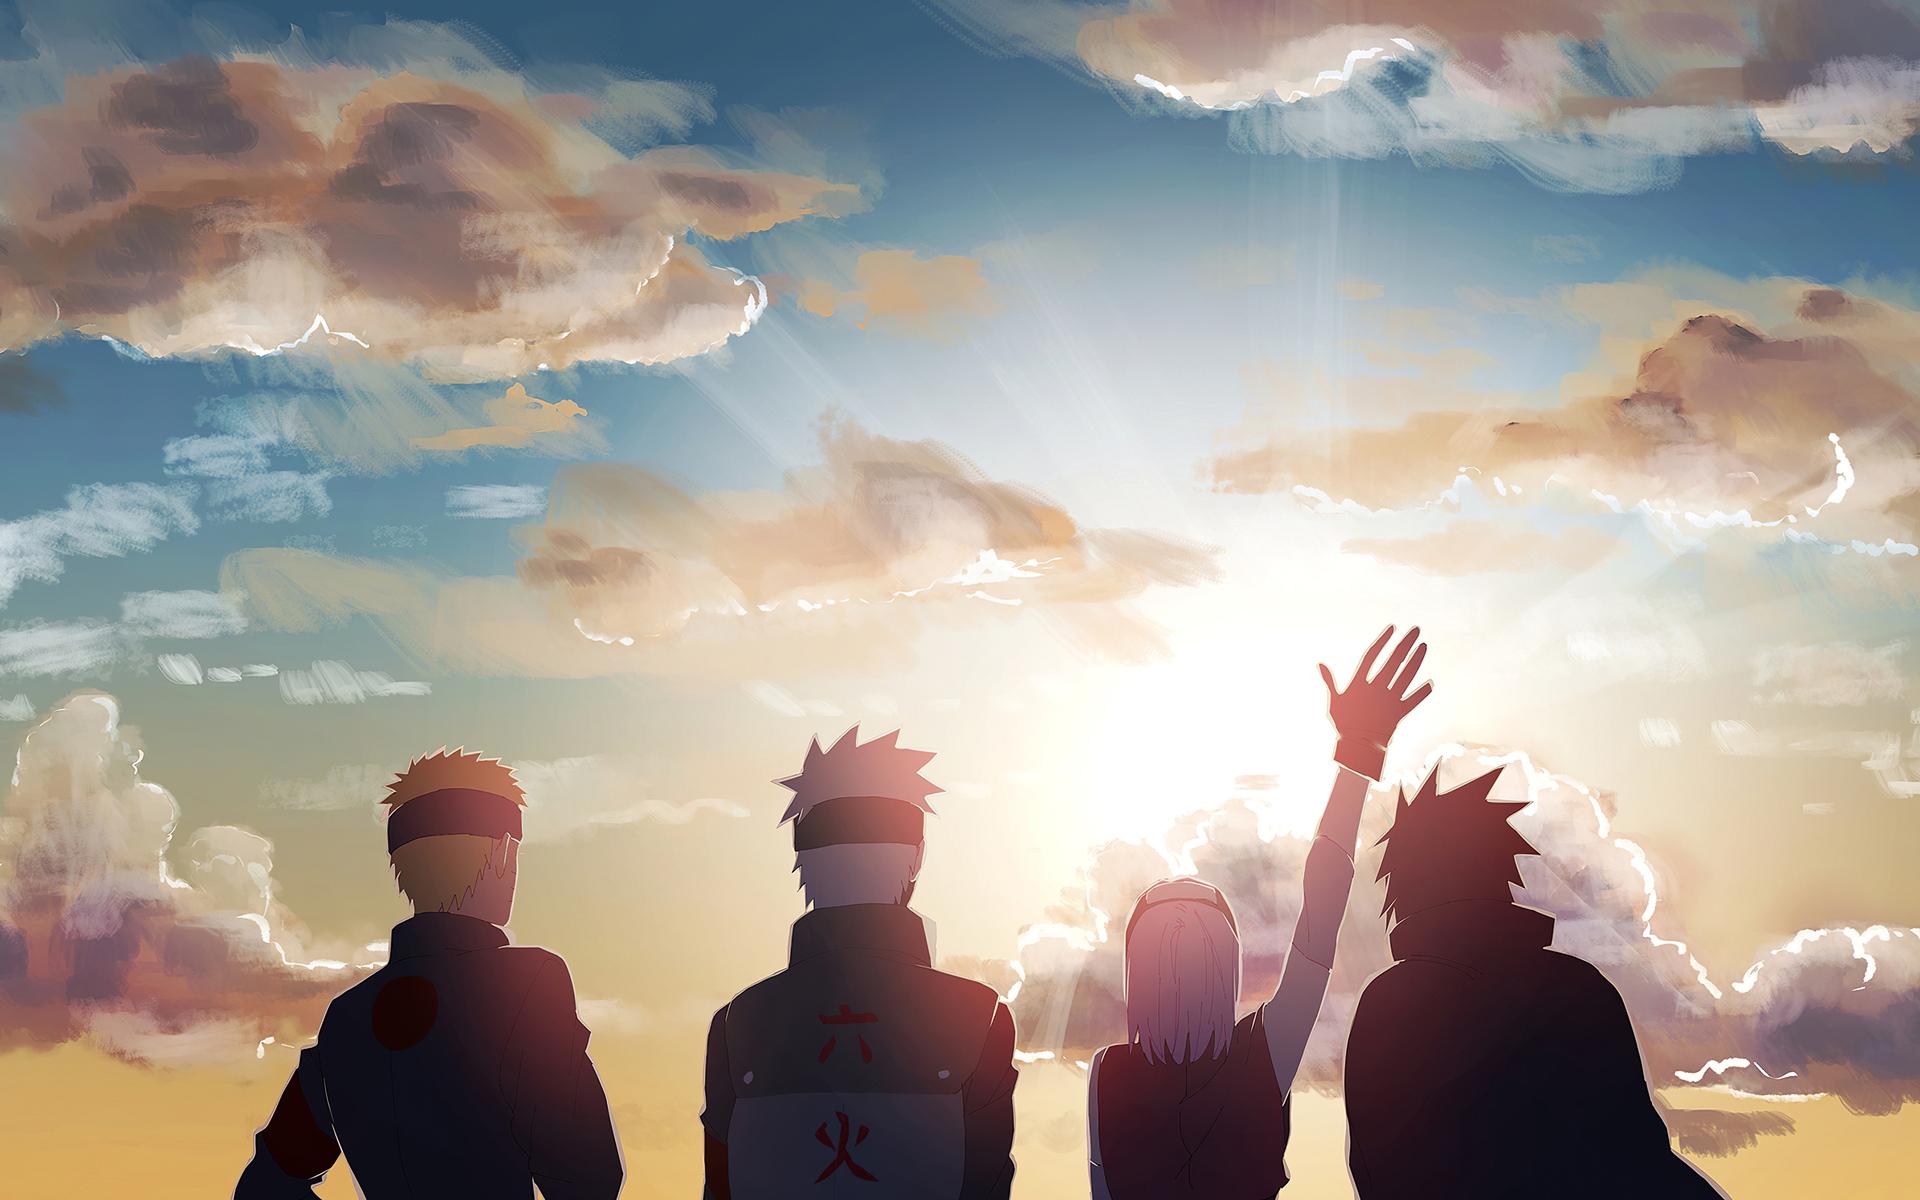 Best hd anime backgrounds for 3840x2160 ultra hd 4k desktop. 1920x1200 Naruto Anime Art 4k 1080P Resolution HD 4k ...